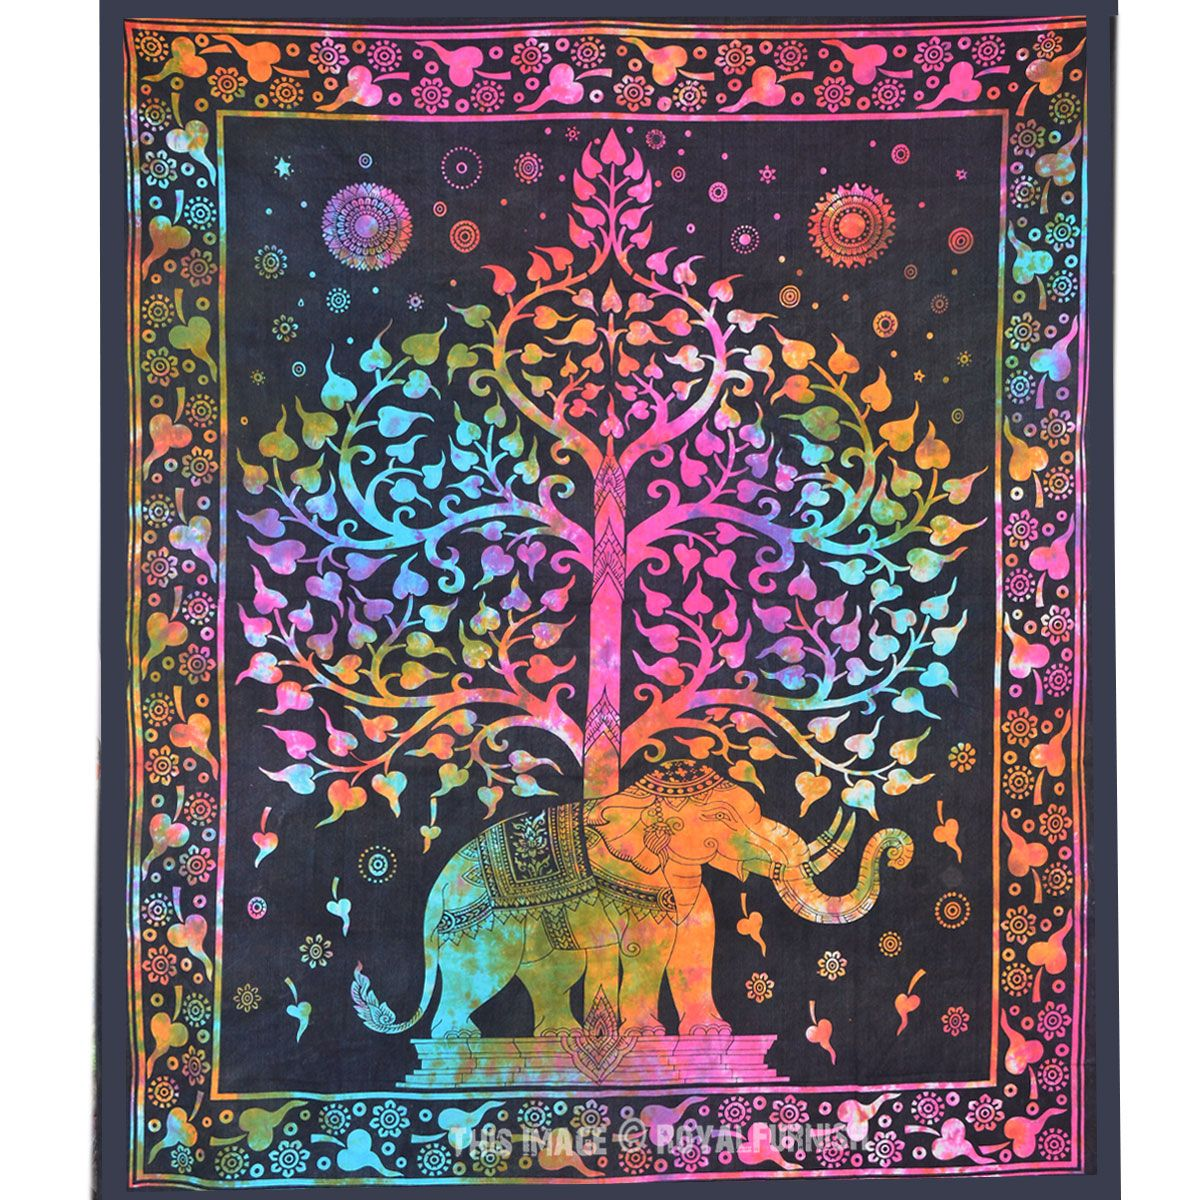 Blue multi elephants sun ombre mandala wall tapestry royalfurnish - Multicolor Tie Dye Colorful Elephant Tree Tapestry Wall Hanging Bedspread Bedding On Royalfurnish Com